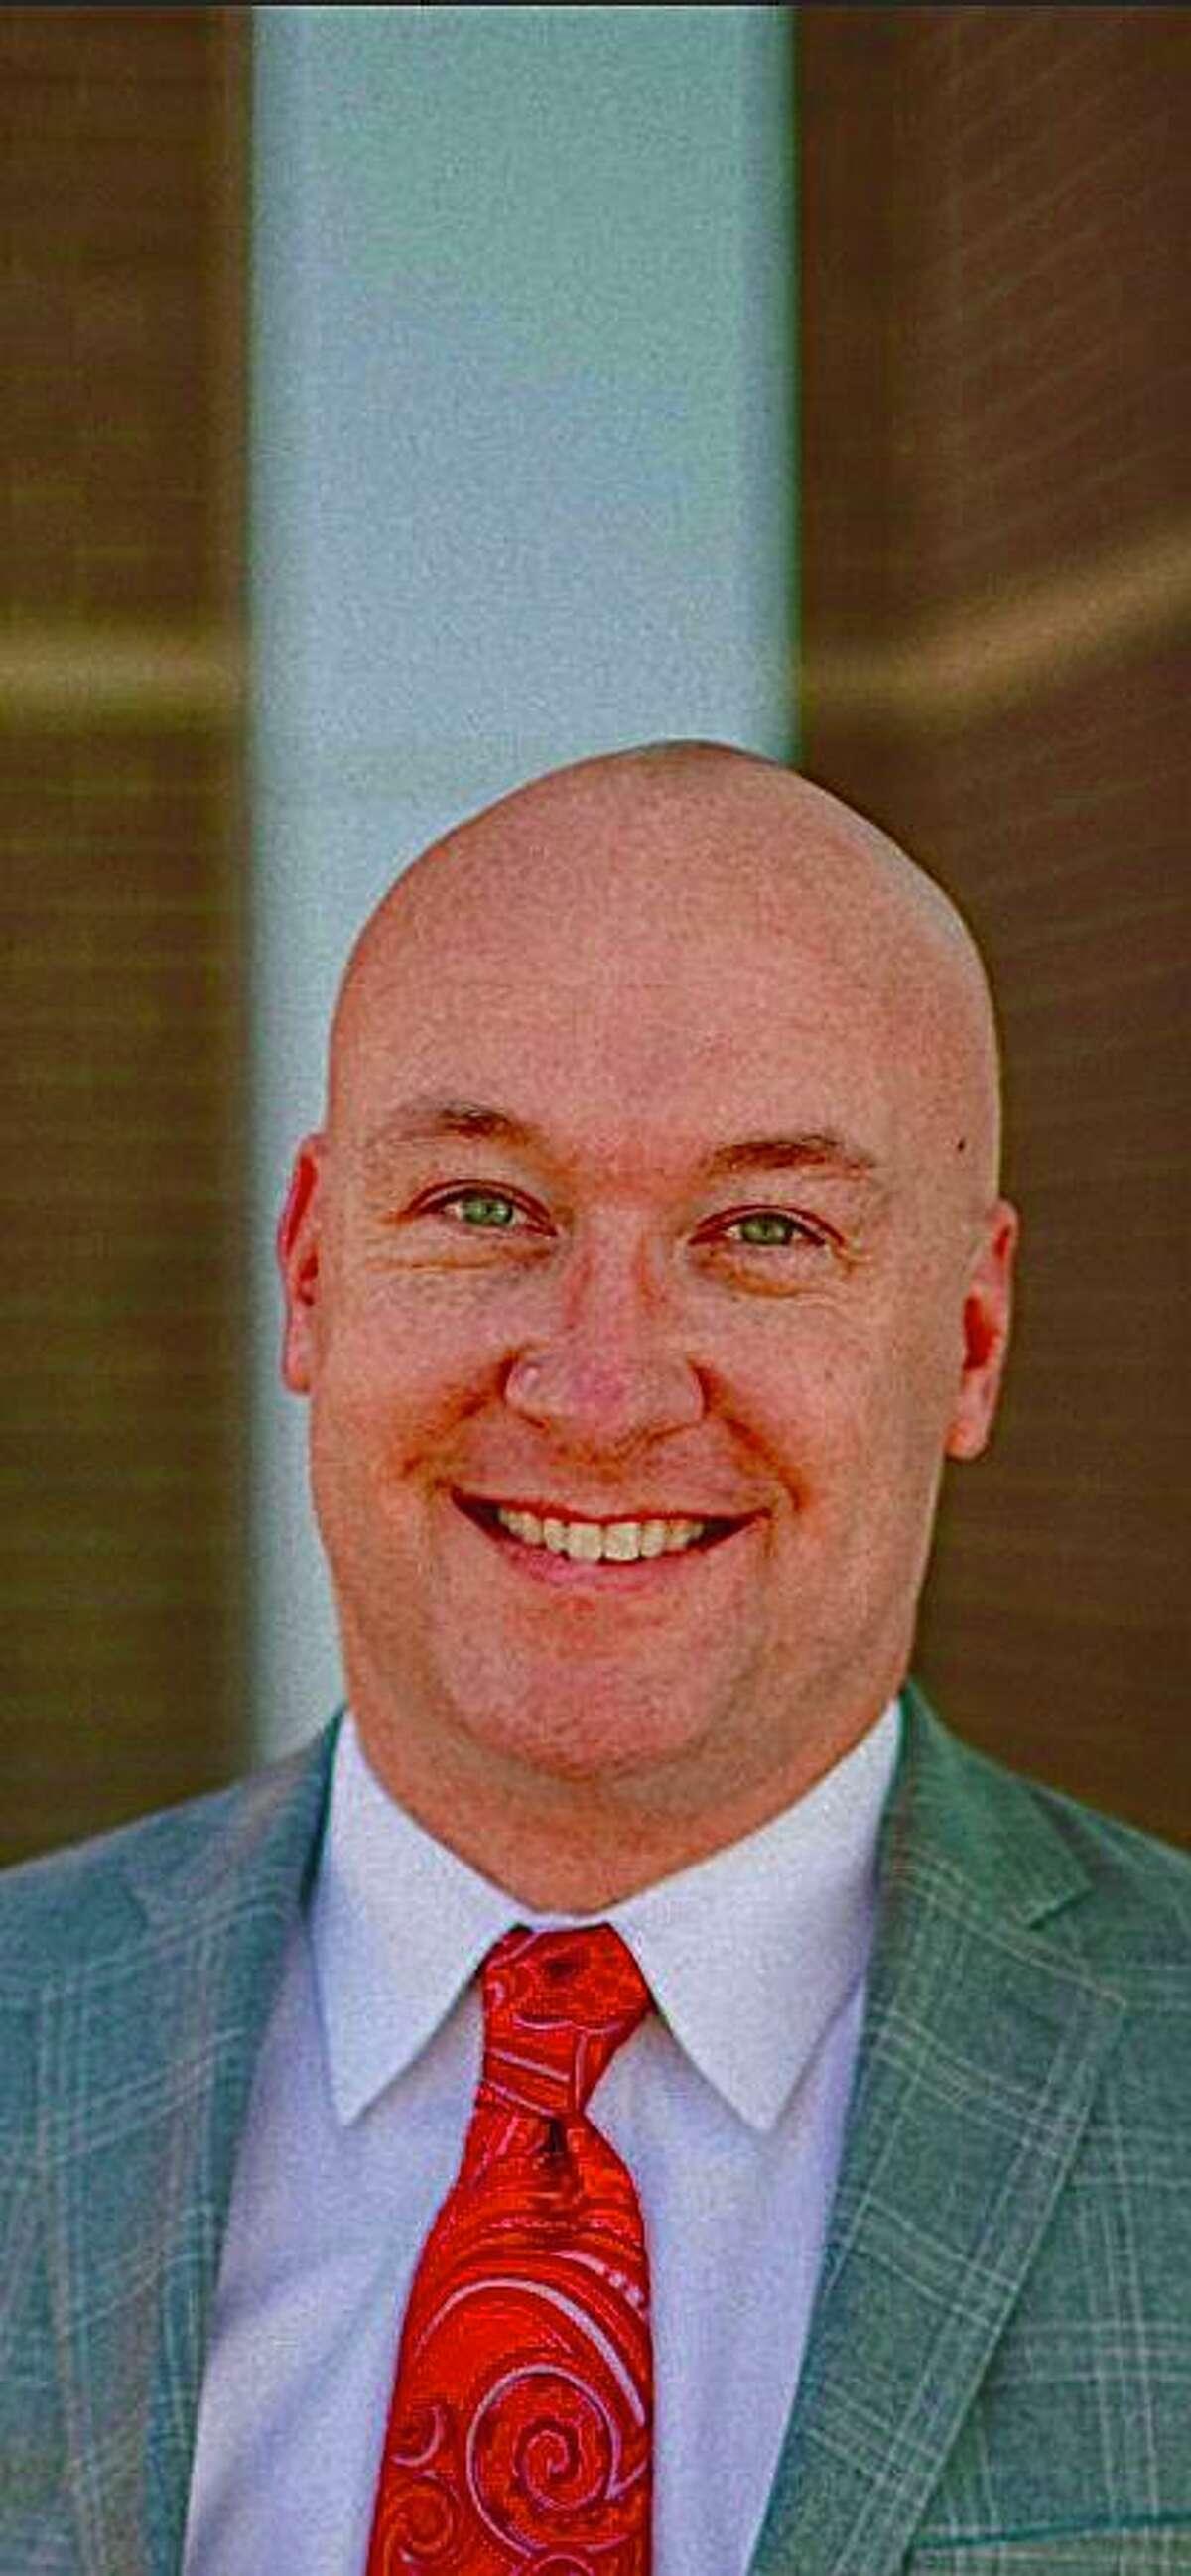 Casey D Phelan is running for Pasadena ISD trustee Position 4 against Al Bledsoe.